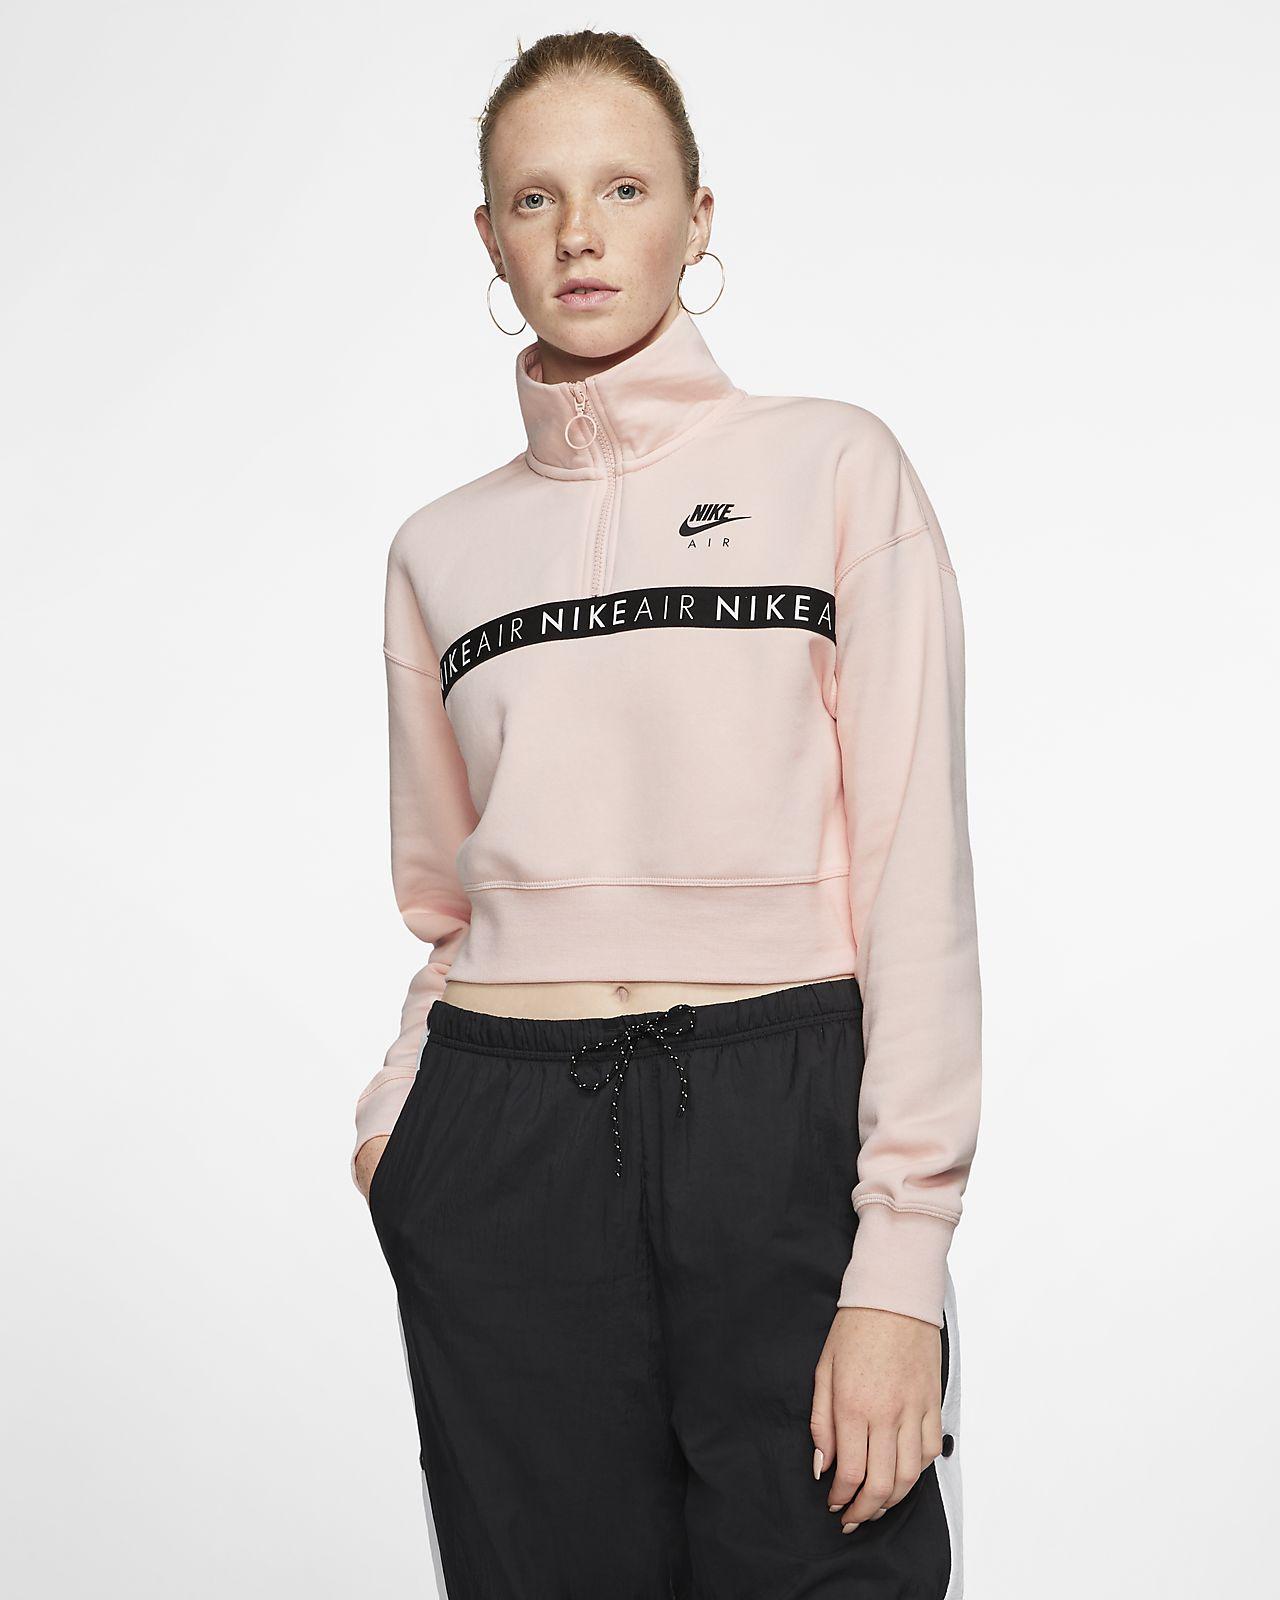 Womens Nike Air Black 14 Zip Fleece Top Black   Compare